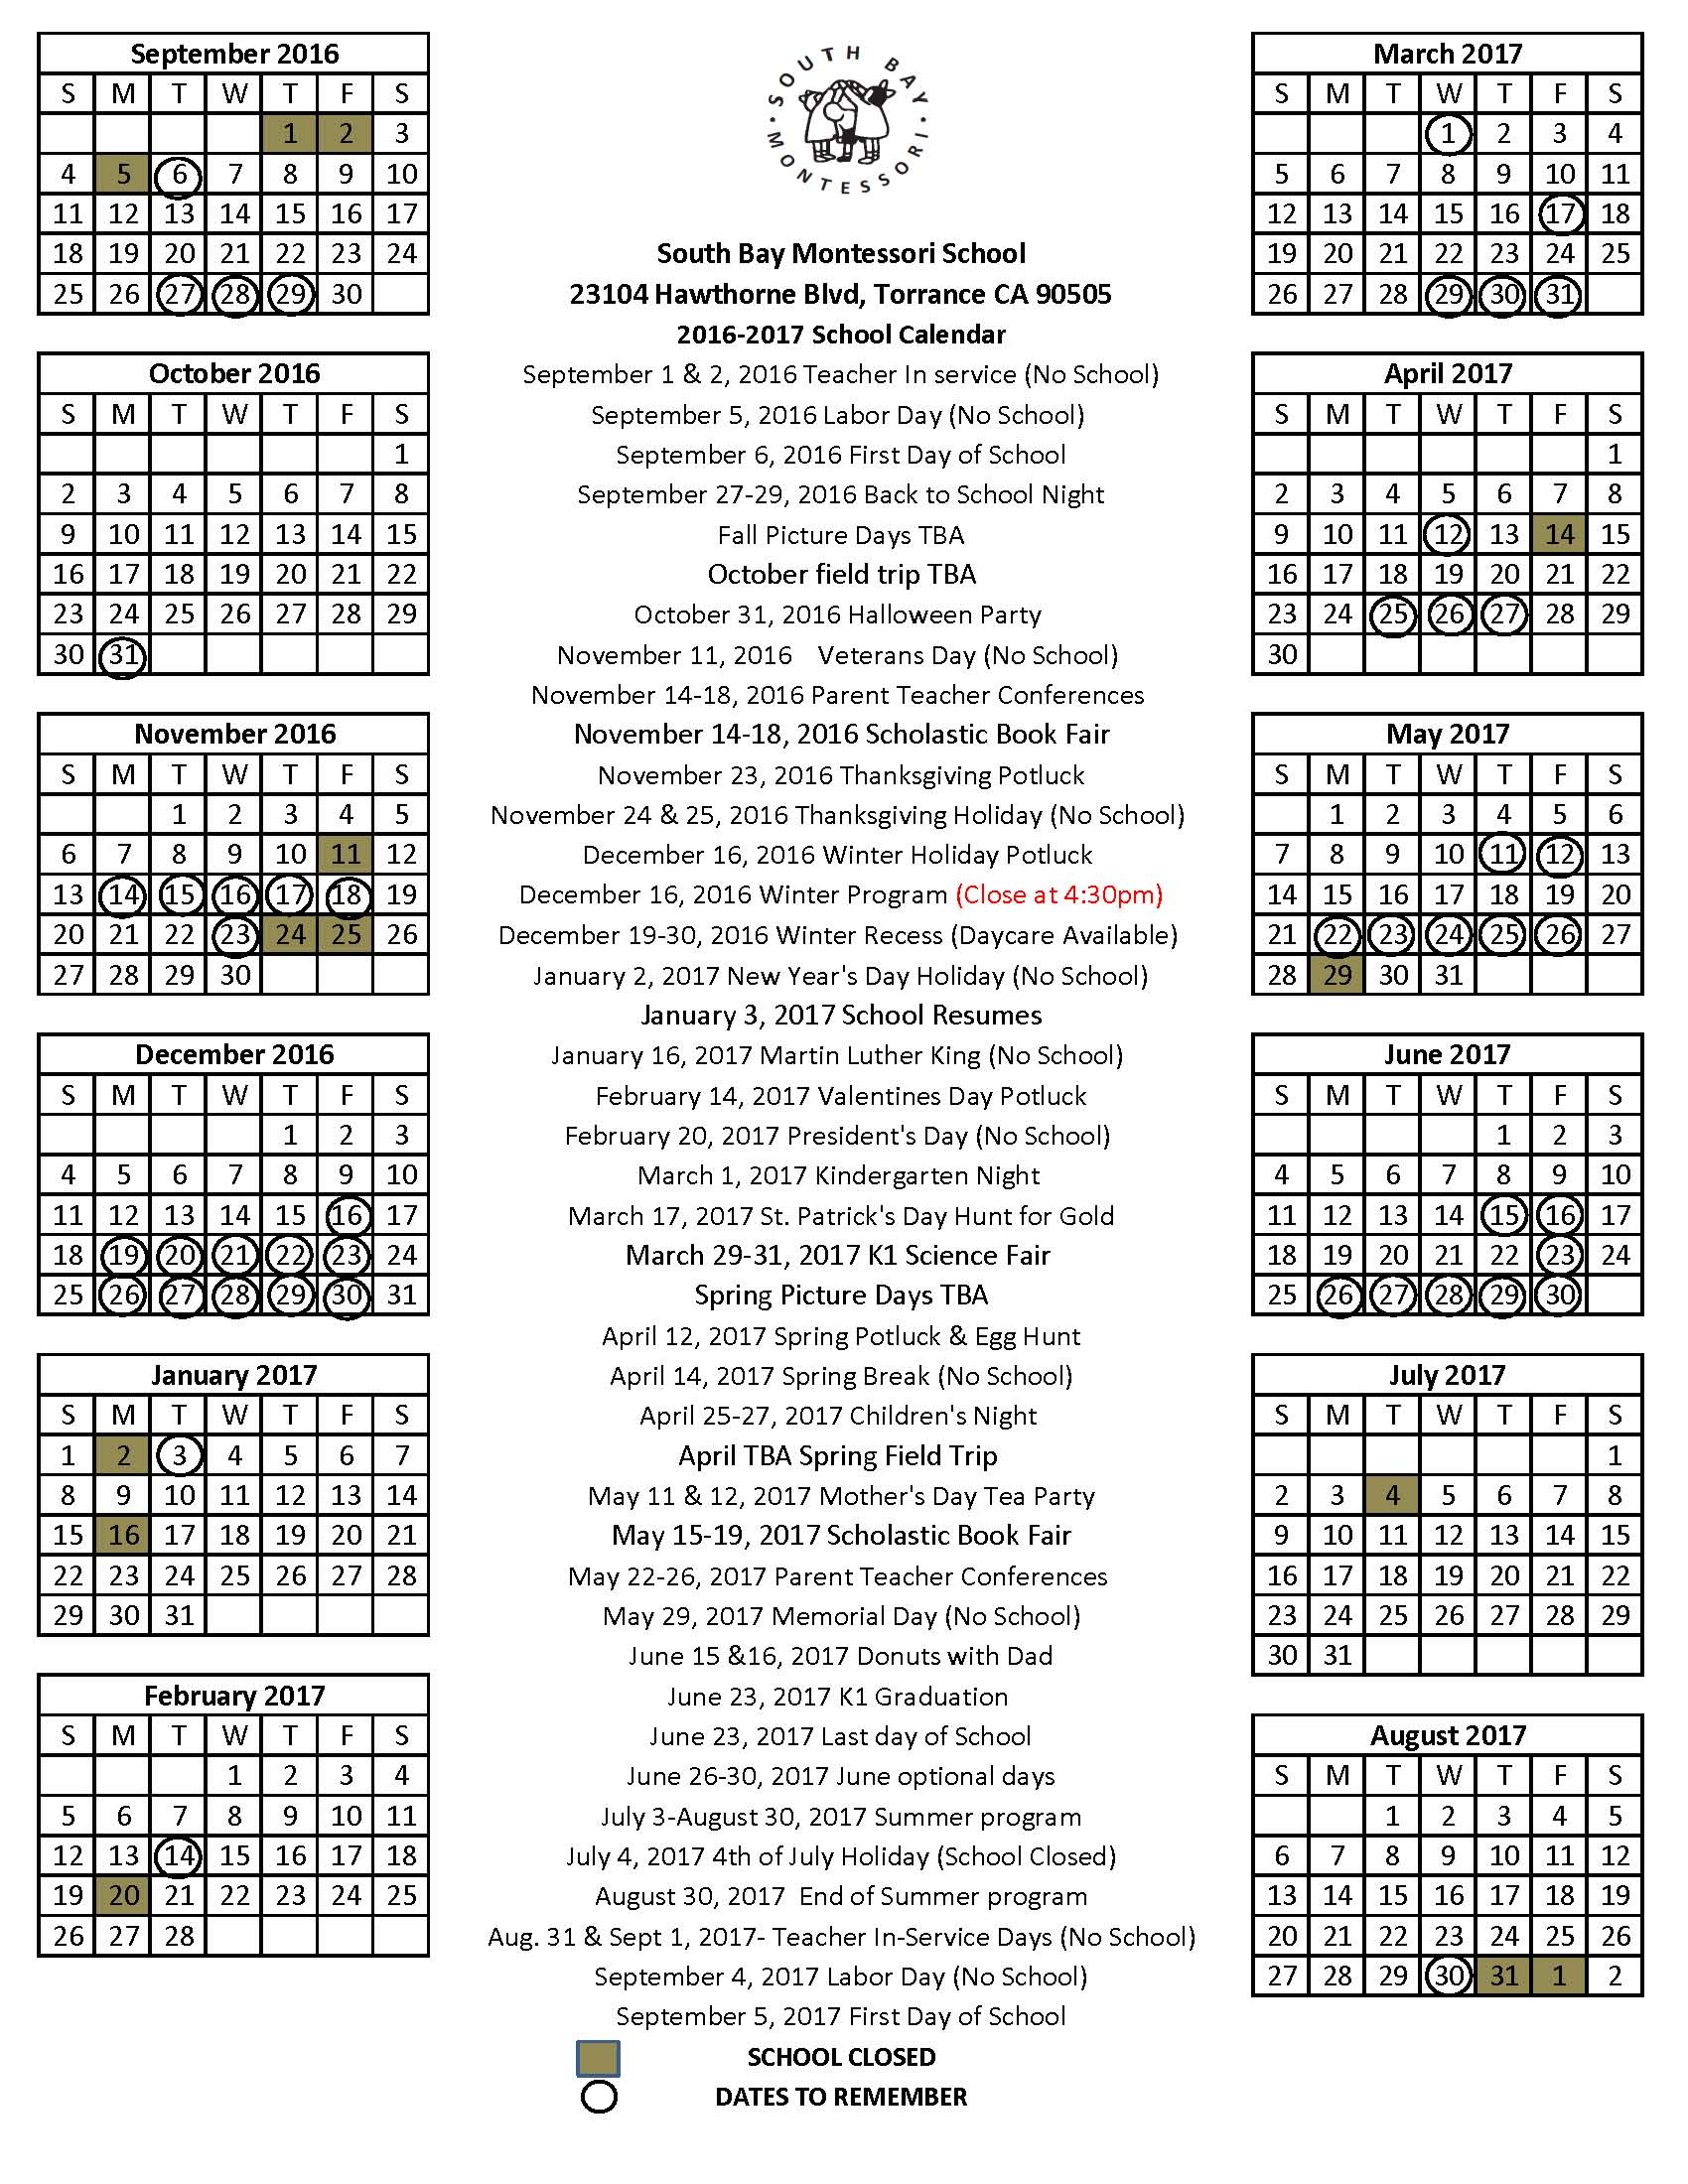 2015-2016 School Calendar South Bay